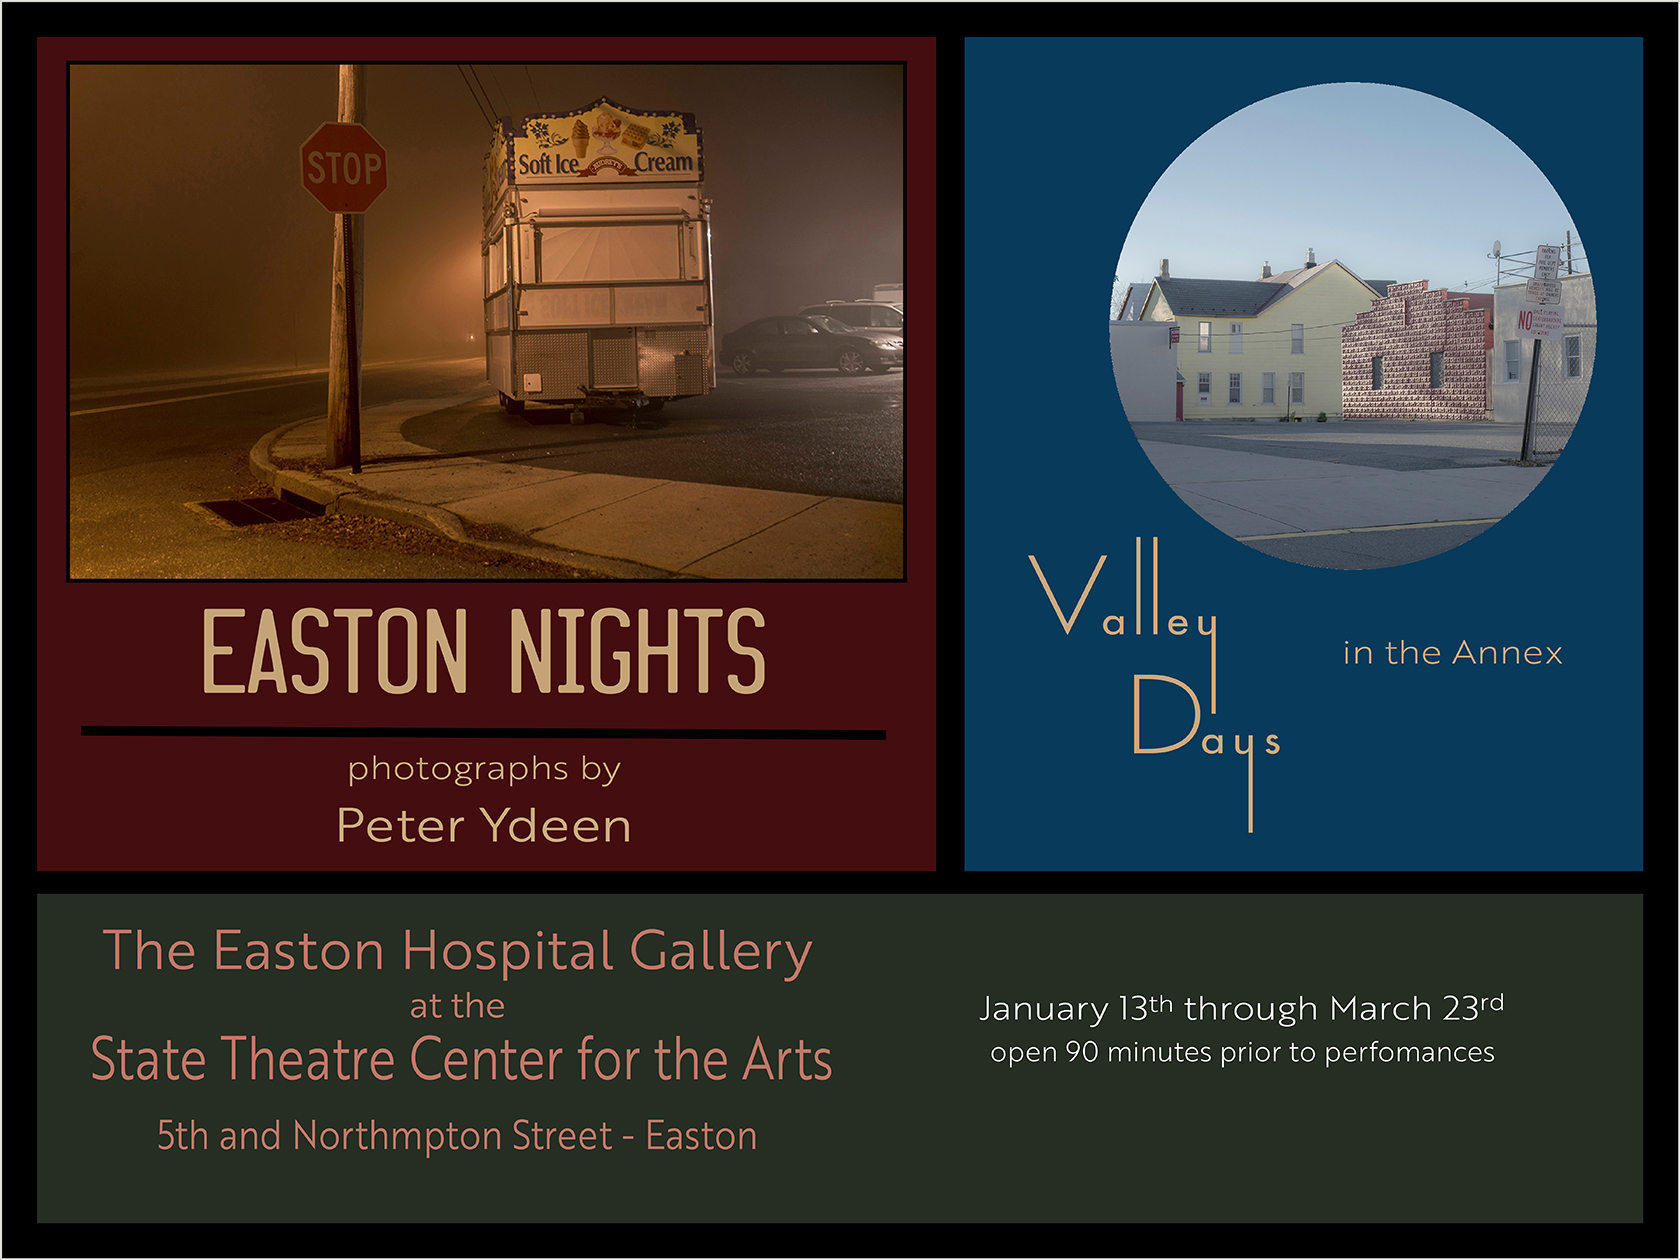 state theater, easton,